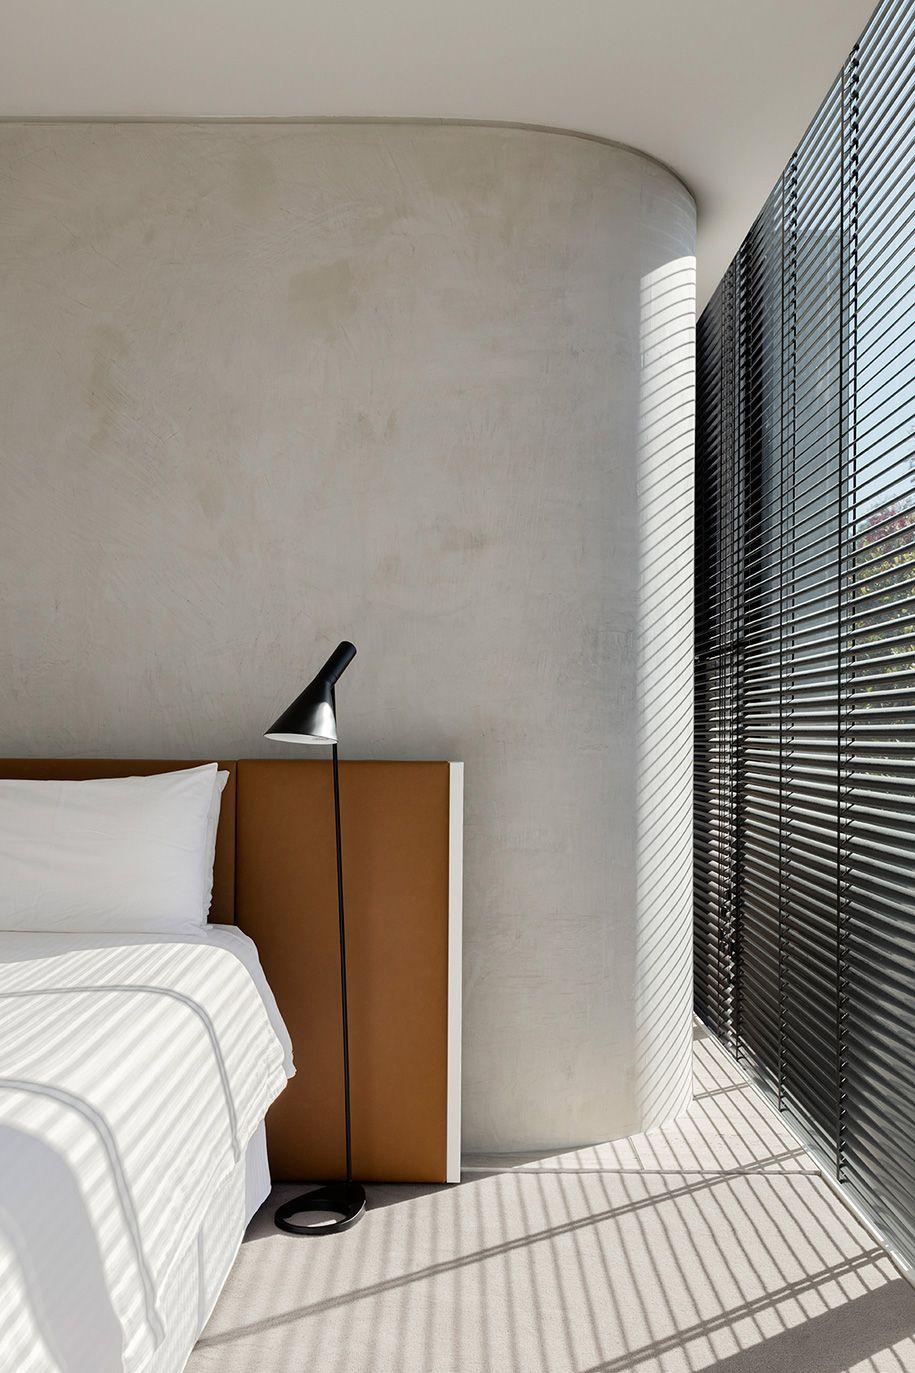 Robert davidov toorak a minimalist and brutalist residence